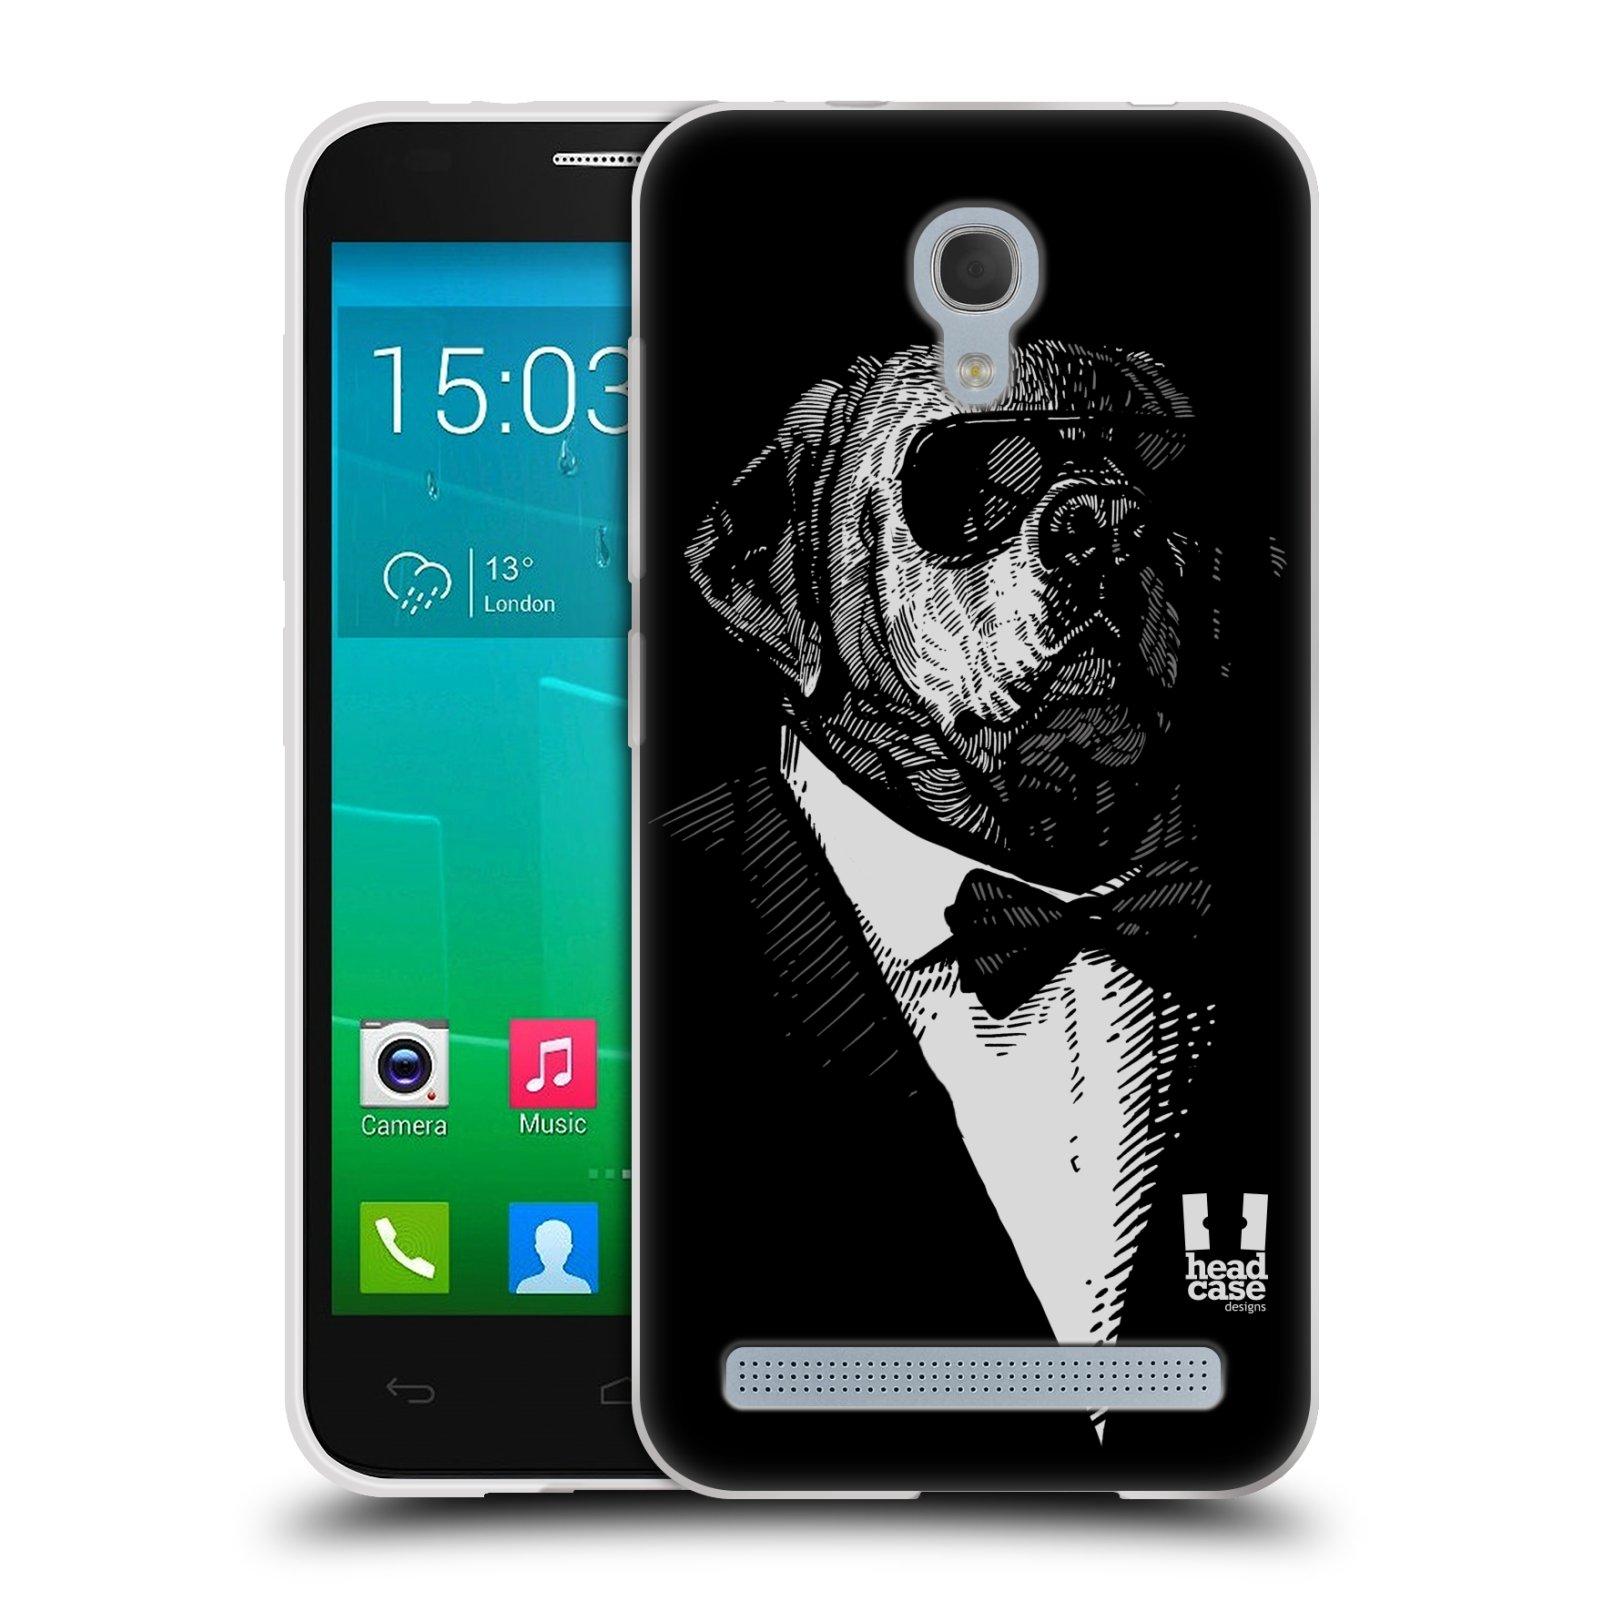 HEAD CASE silikonový obal na mobil Alcatel Idol 2 MINI S 6036Y vzor Zvíře v obleku pes